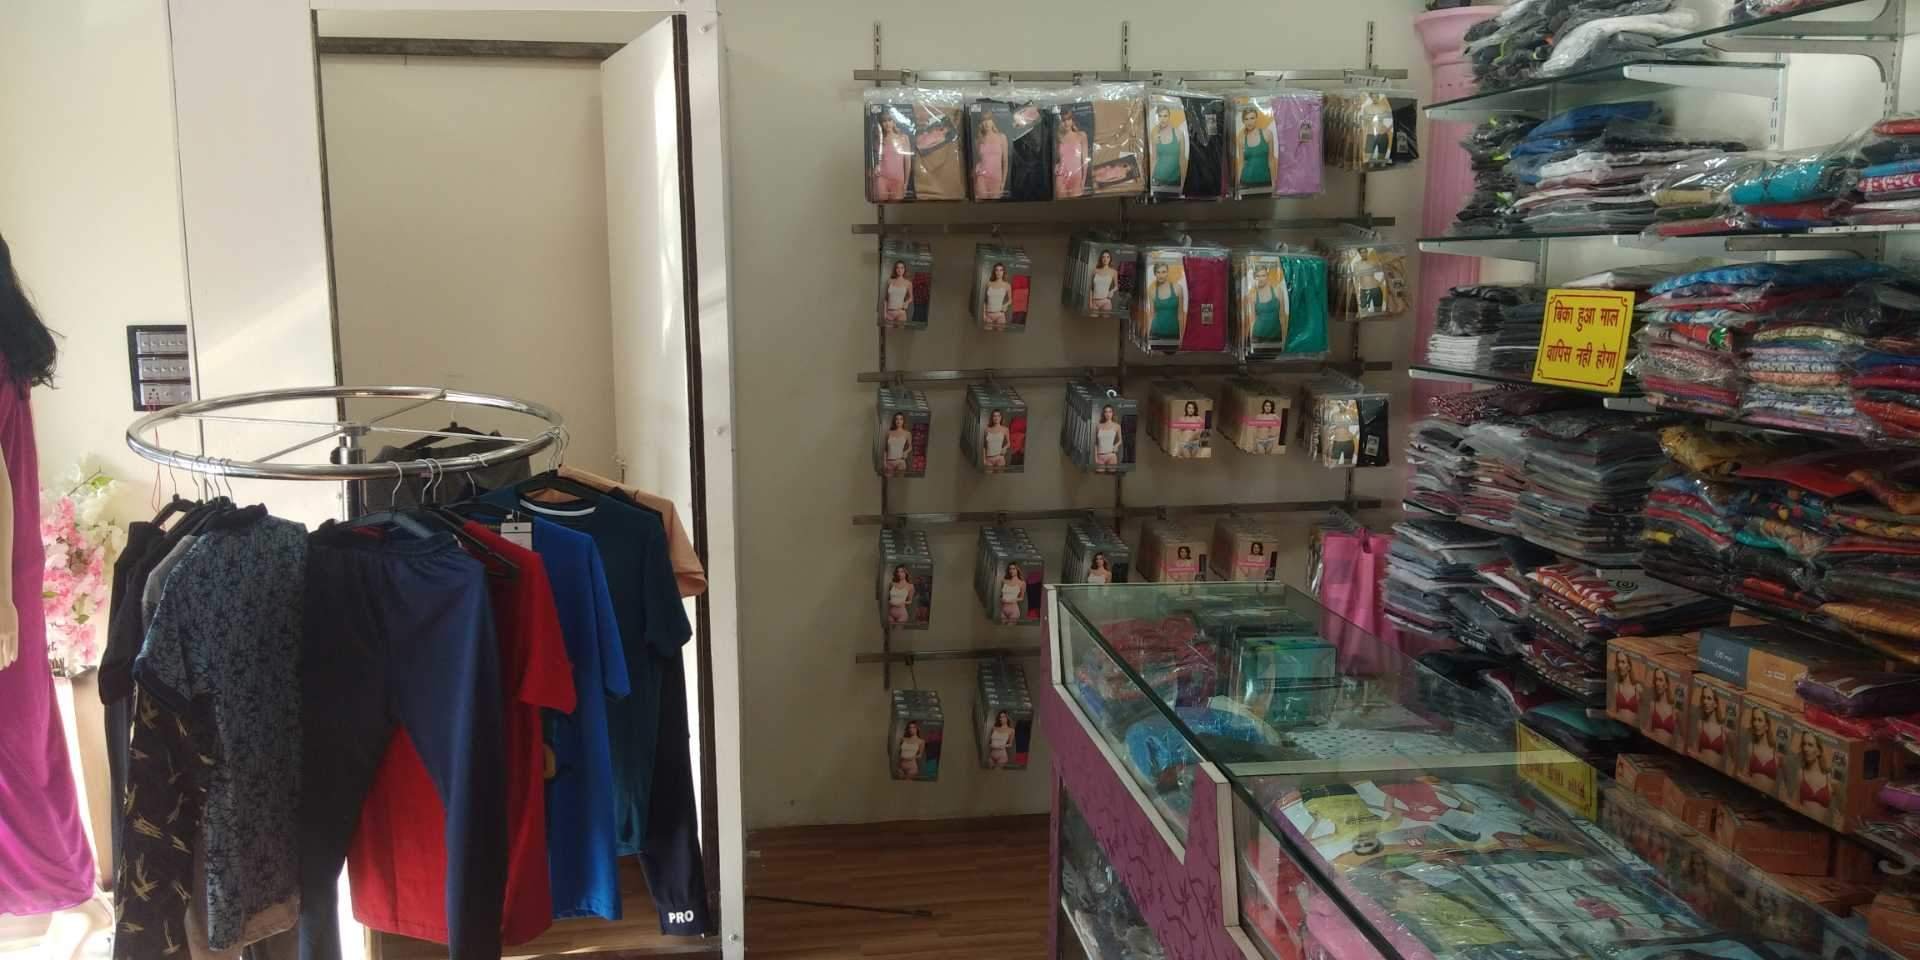 b1c86bd3a2 Top 100 Gents Readymade Garment Retailers in Viman Nagar - Best ...